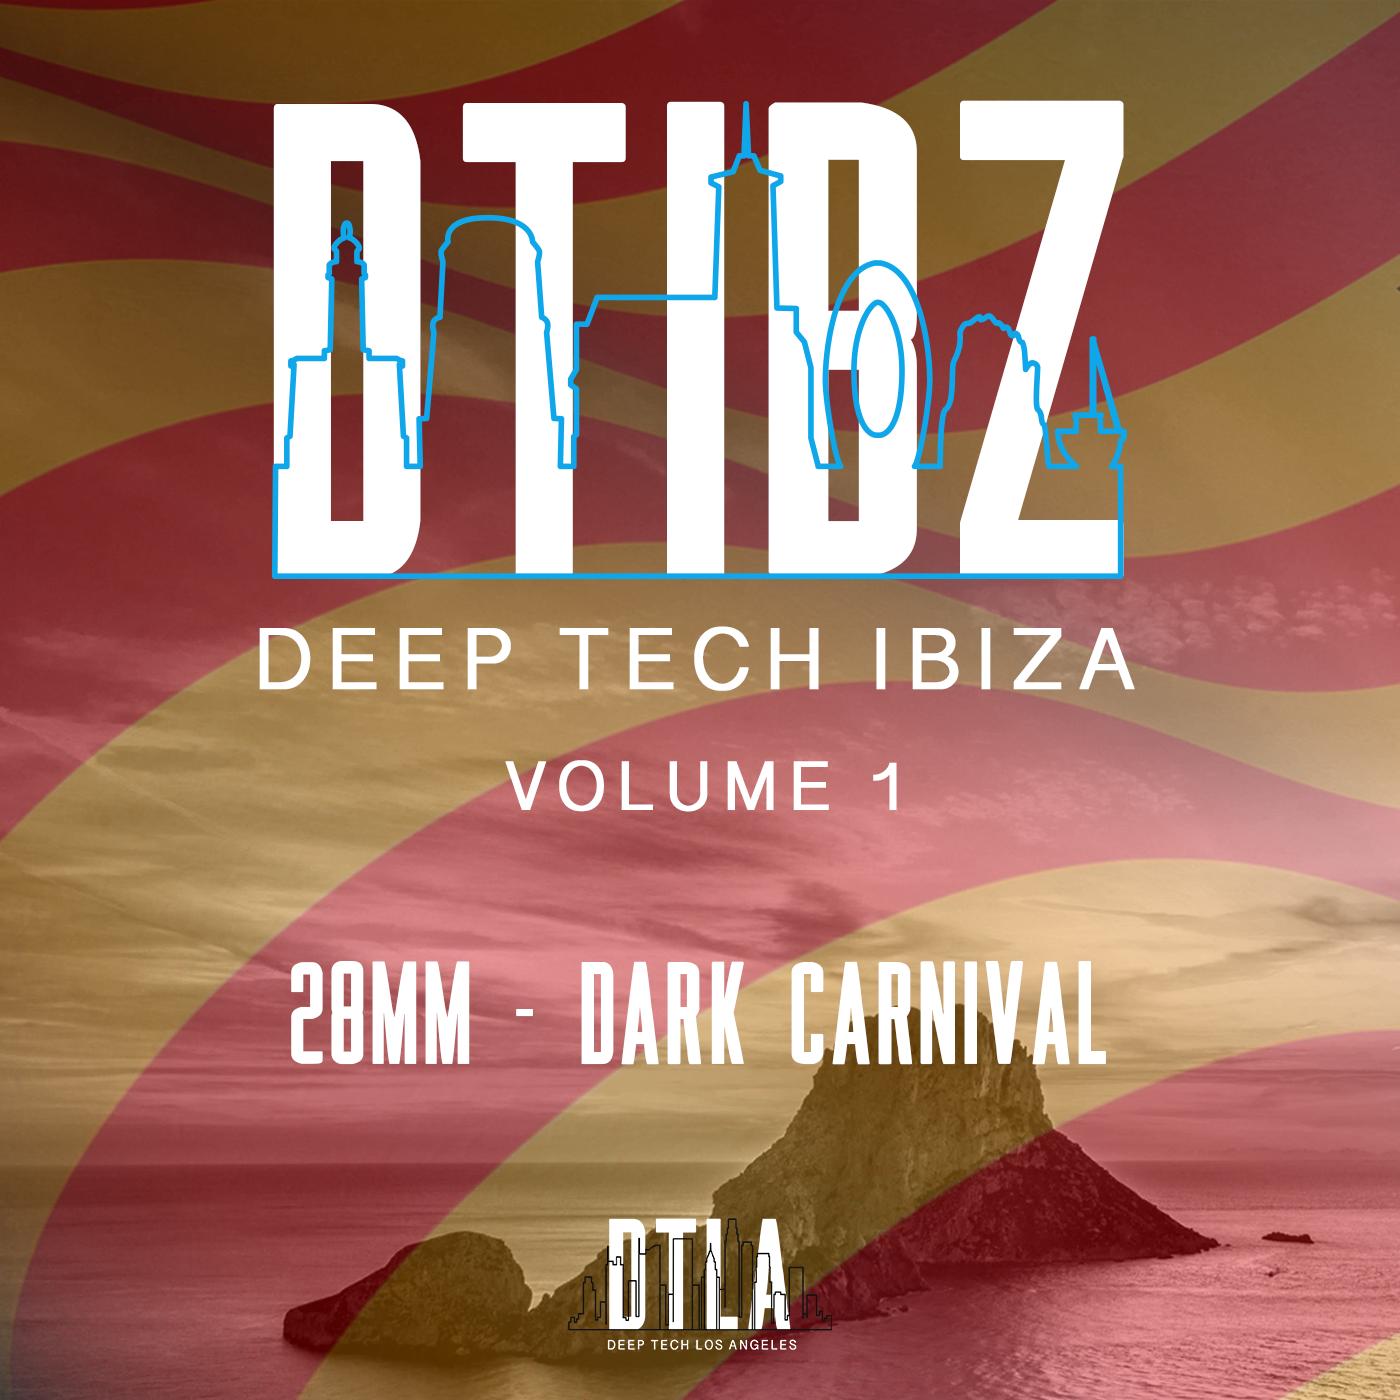 Deep Tech LA - Dark Carnival